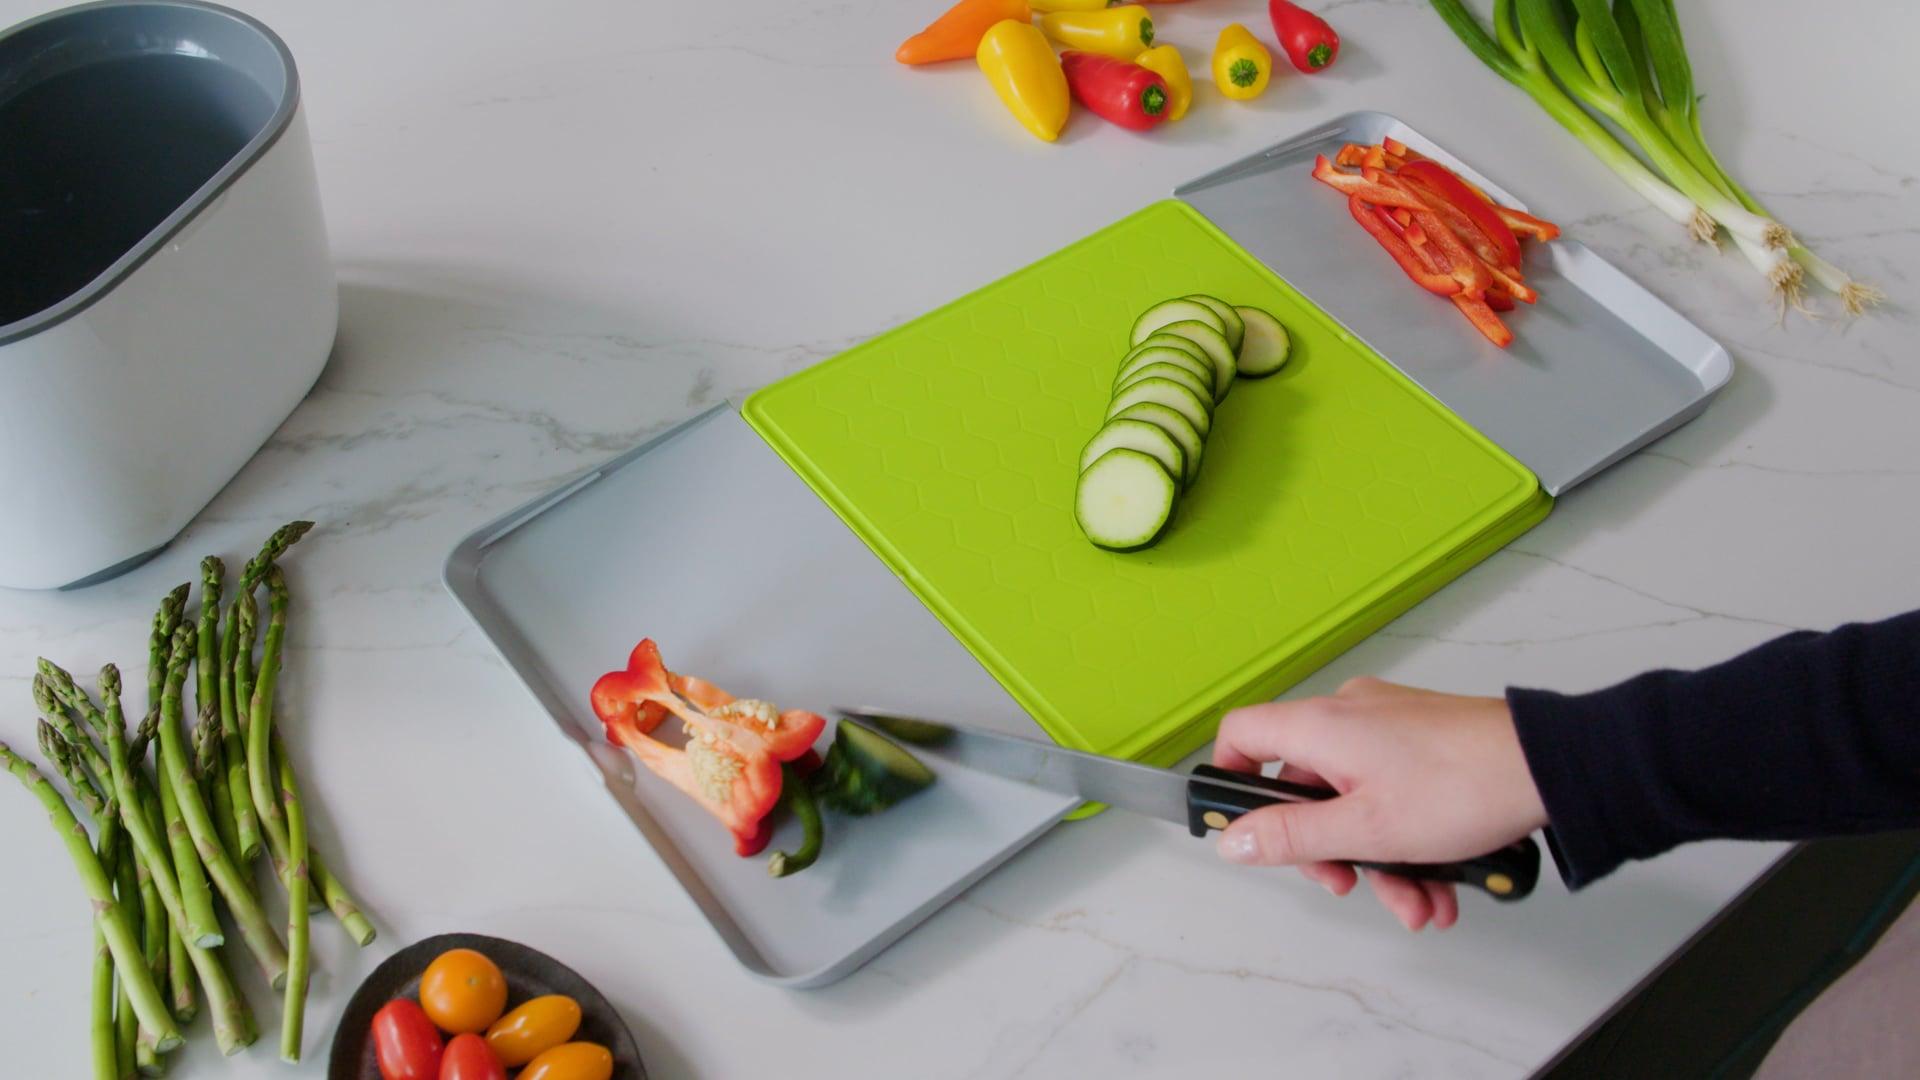 Our Kickstarter Campaign for Chop+Swipe